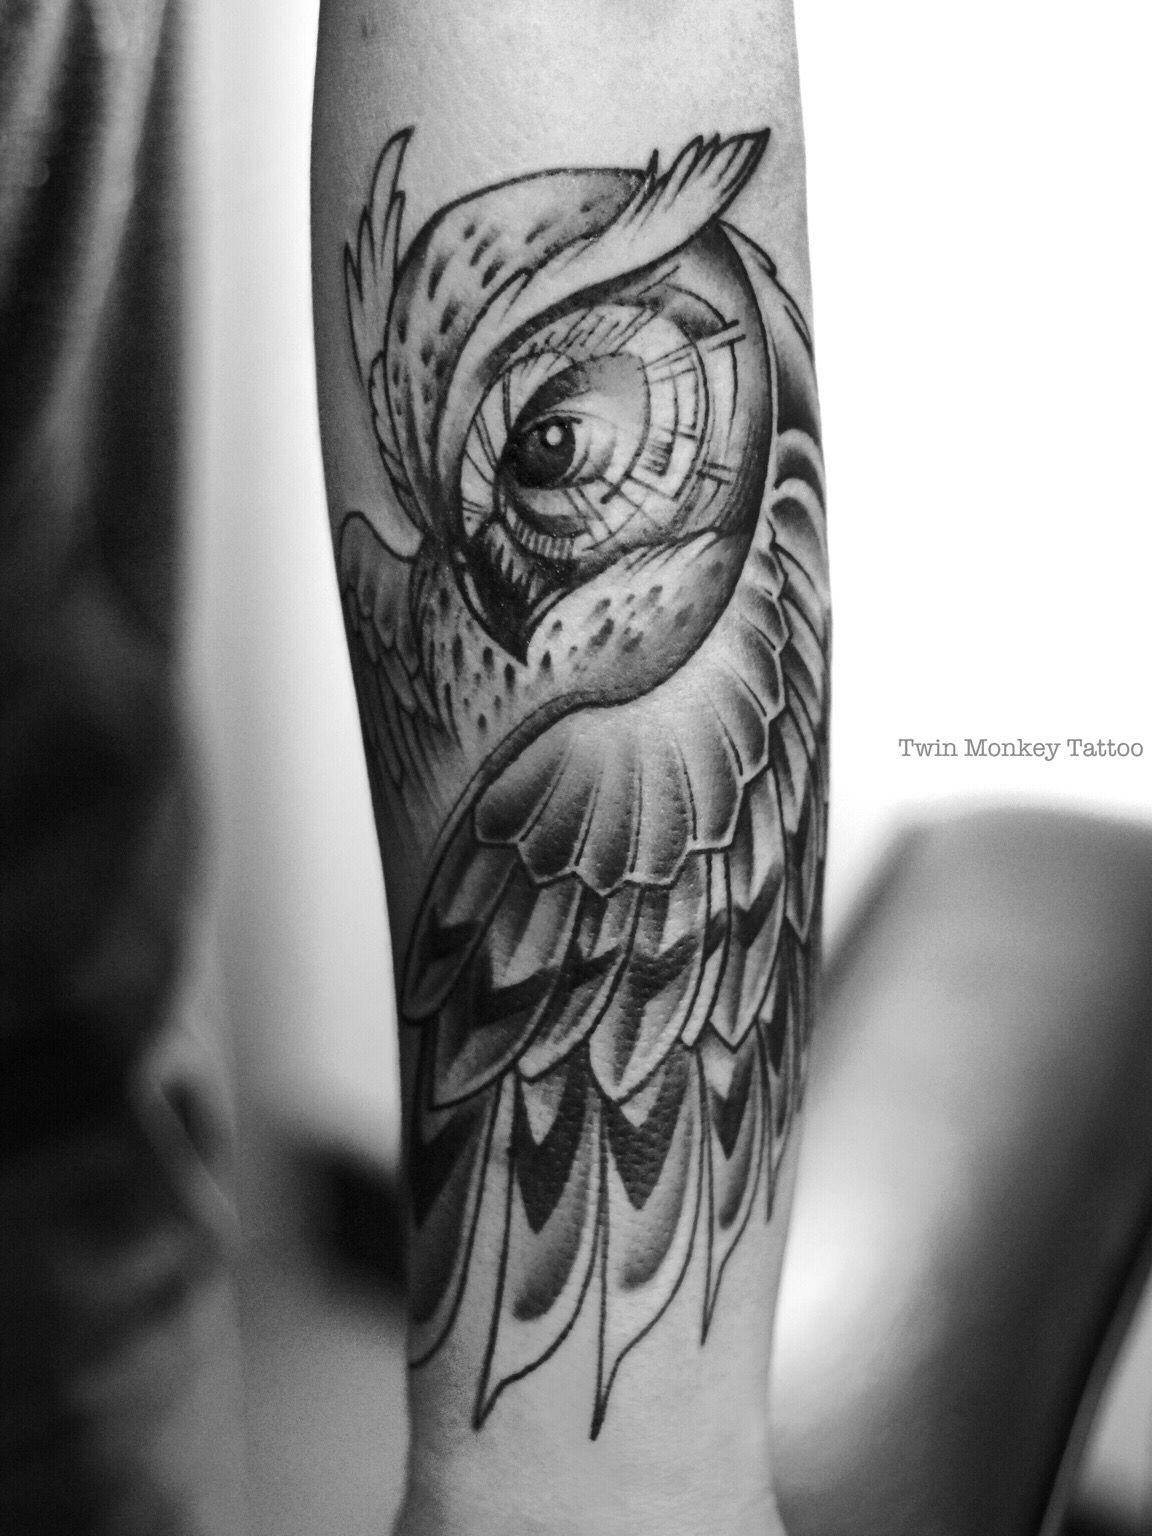 Twinmonkeytattoo Owl Tattoo Art Black Grey Custom Animal Owl Tattoo Sleeve Owl Tattoo Monkey Tattoos